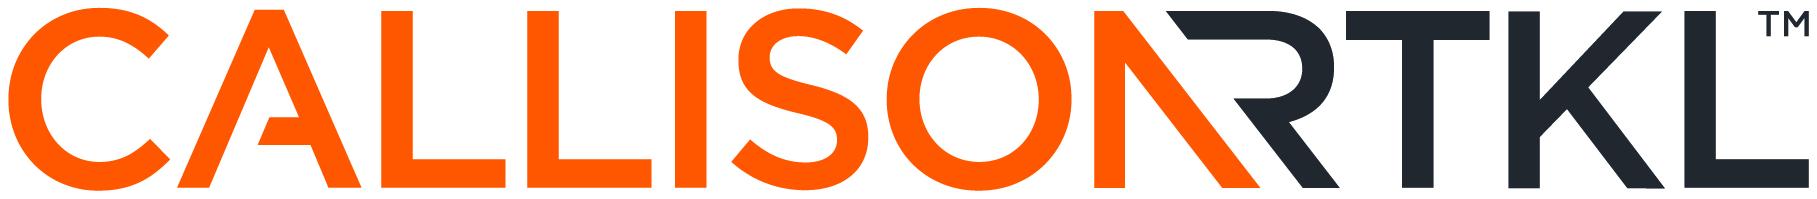 2019 Empowering - CallisonRTKL logo